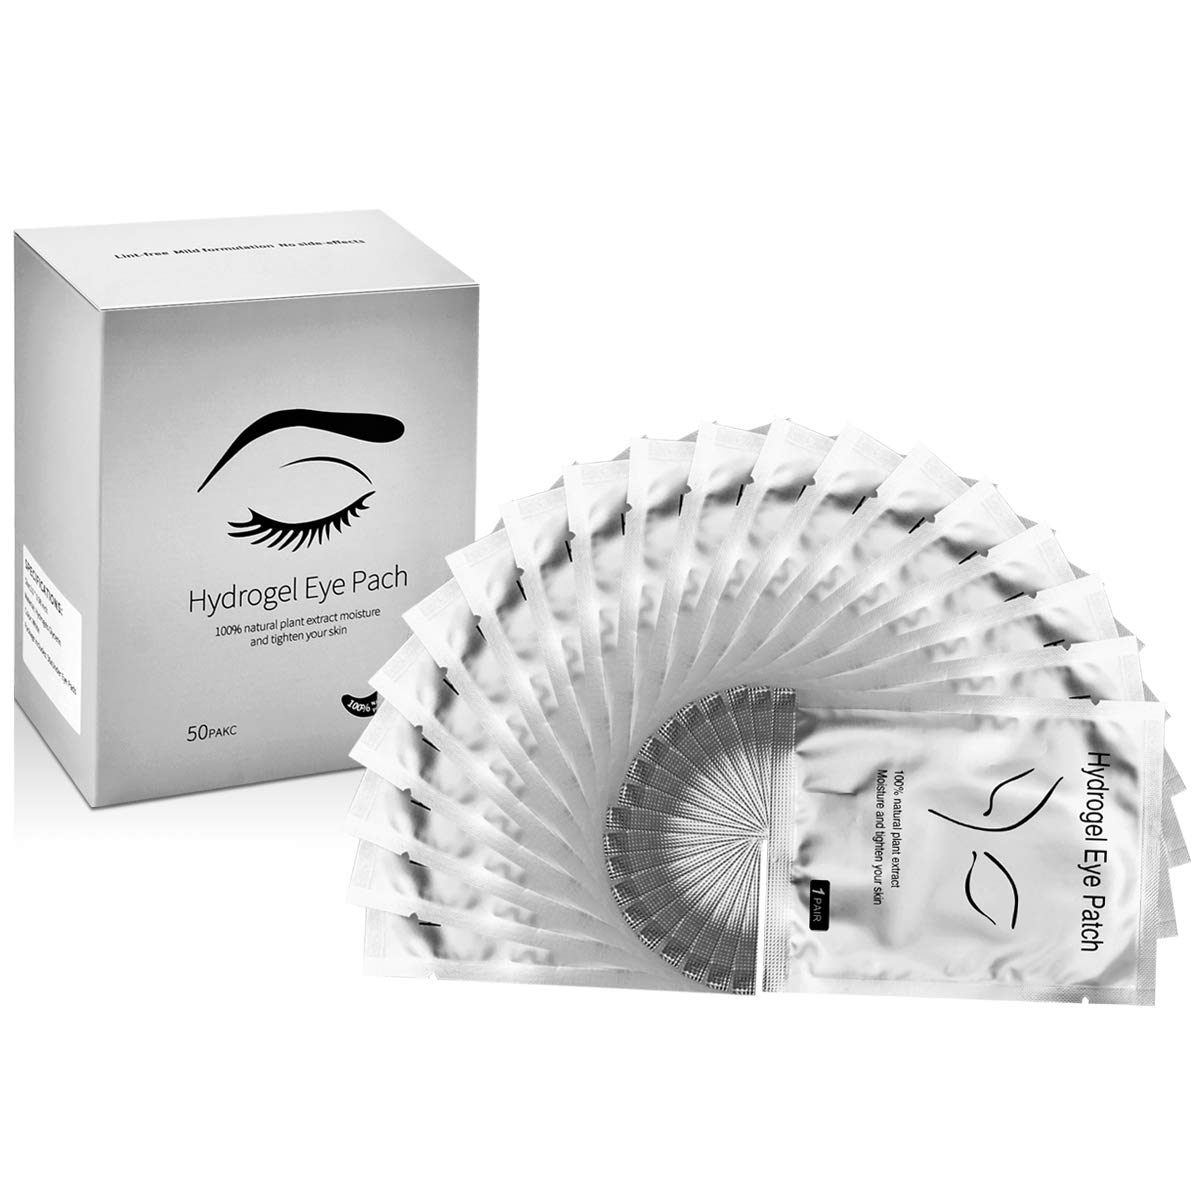 Under Eye gel Pads, Tsmaddts pelucchi Lash extension Eye gel Patches for Eyelash extension Eye Mask beauty Tool–50paia